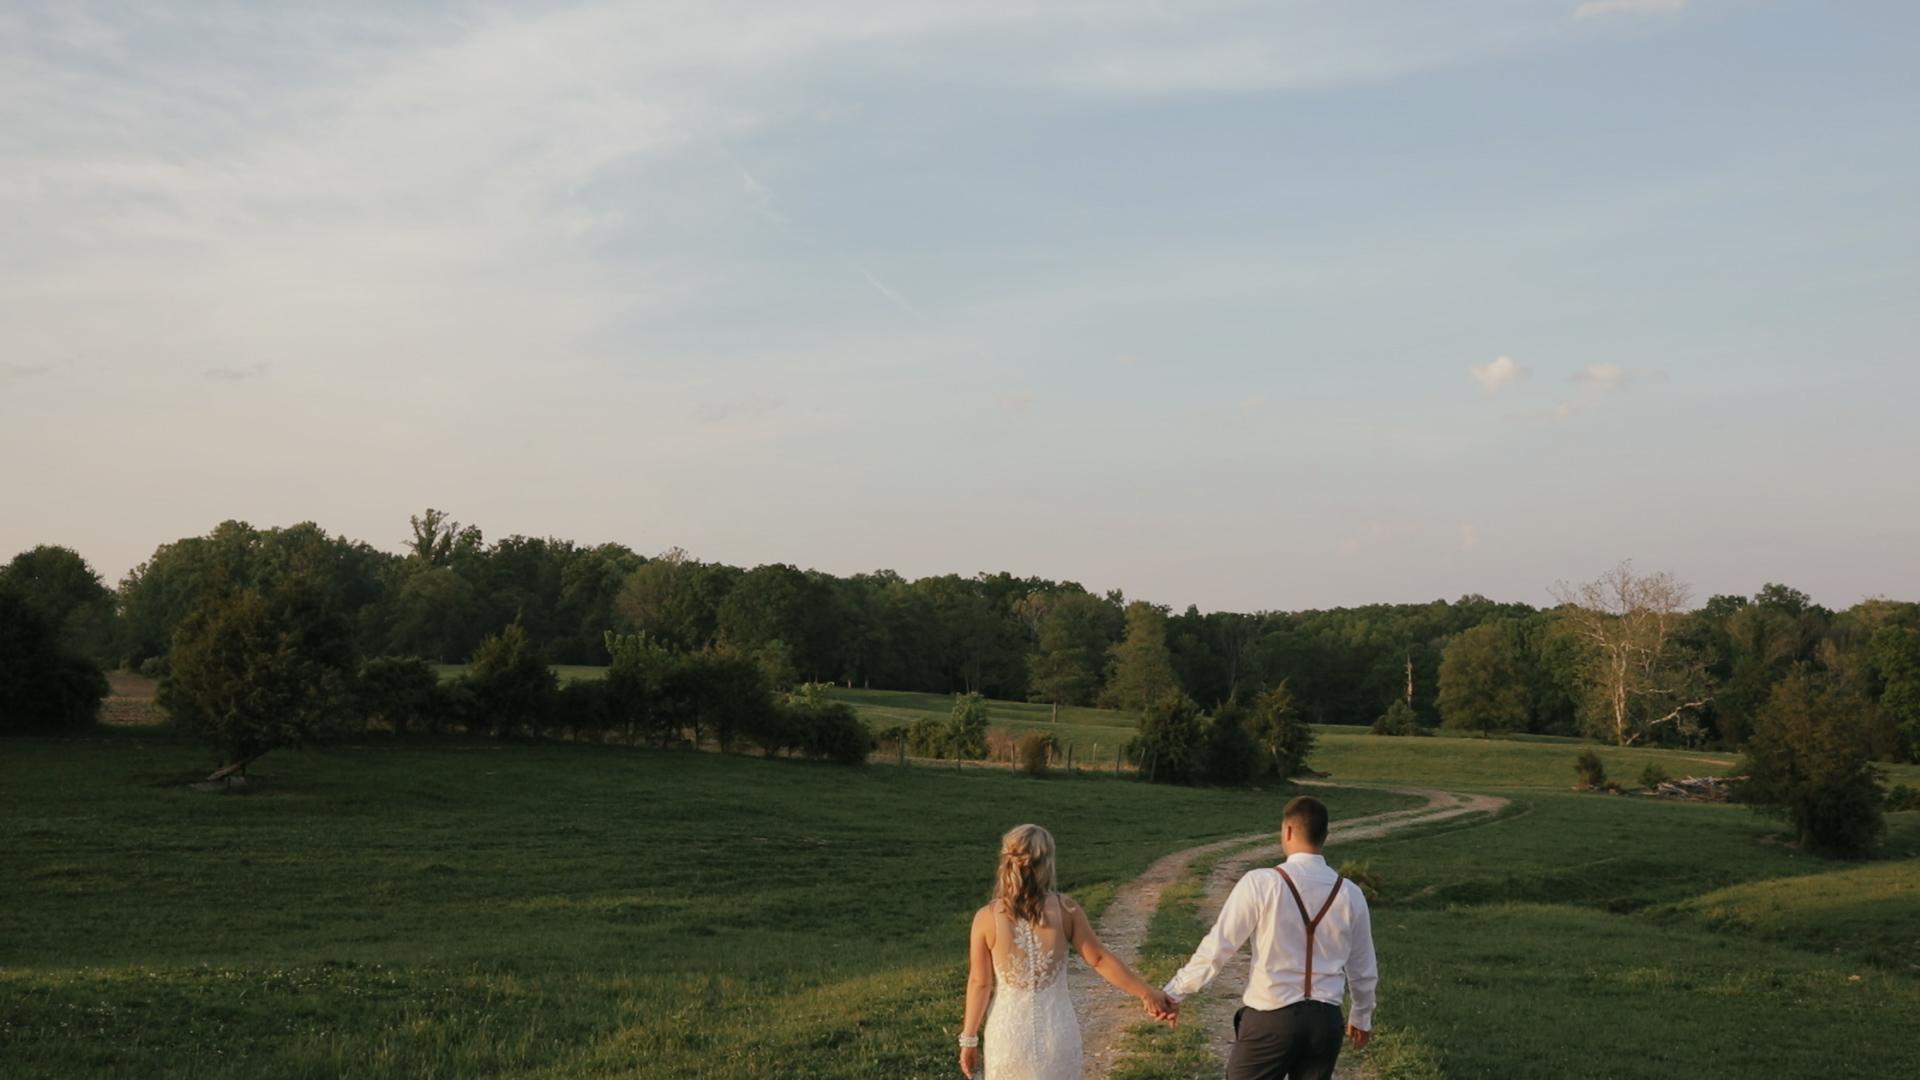 Leah + William | Bloomington, Indiana | The Barn on Maryland Ridge